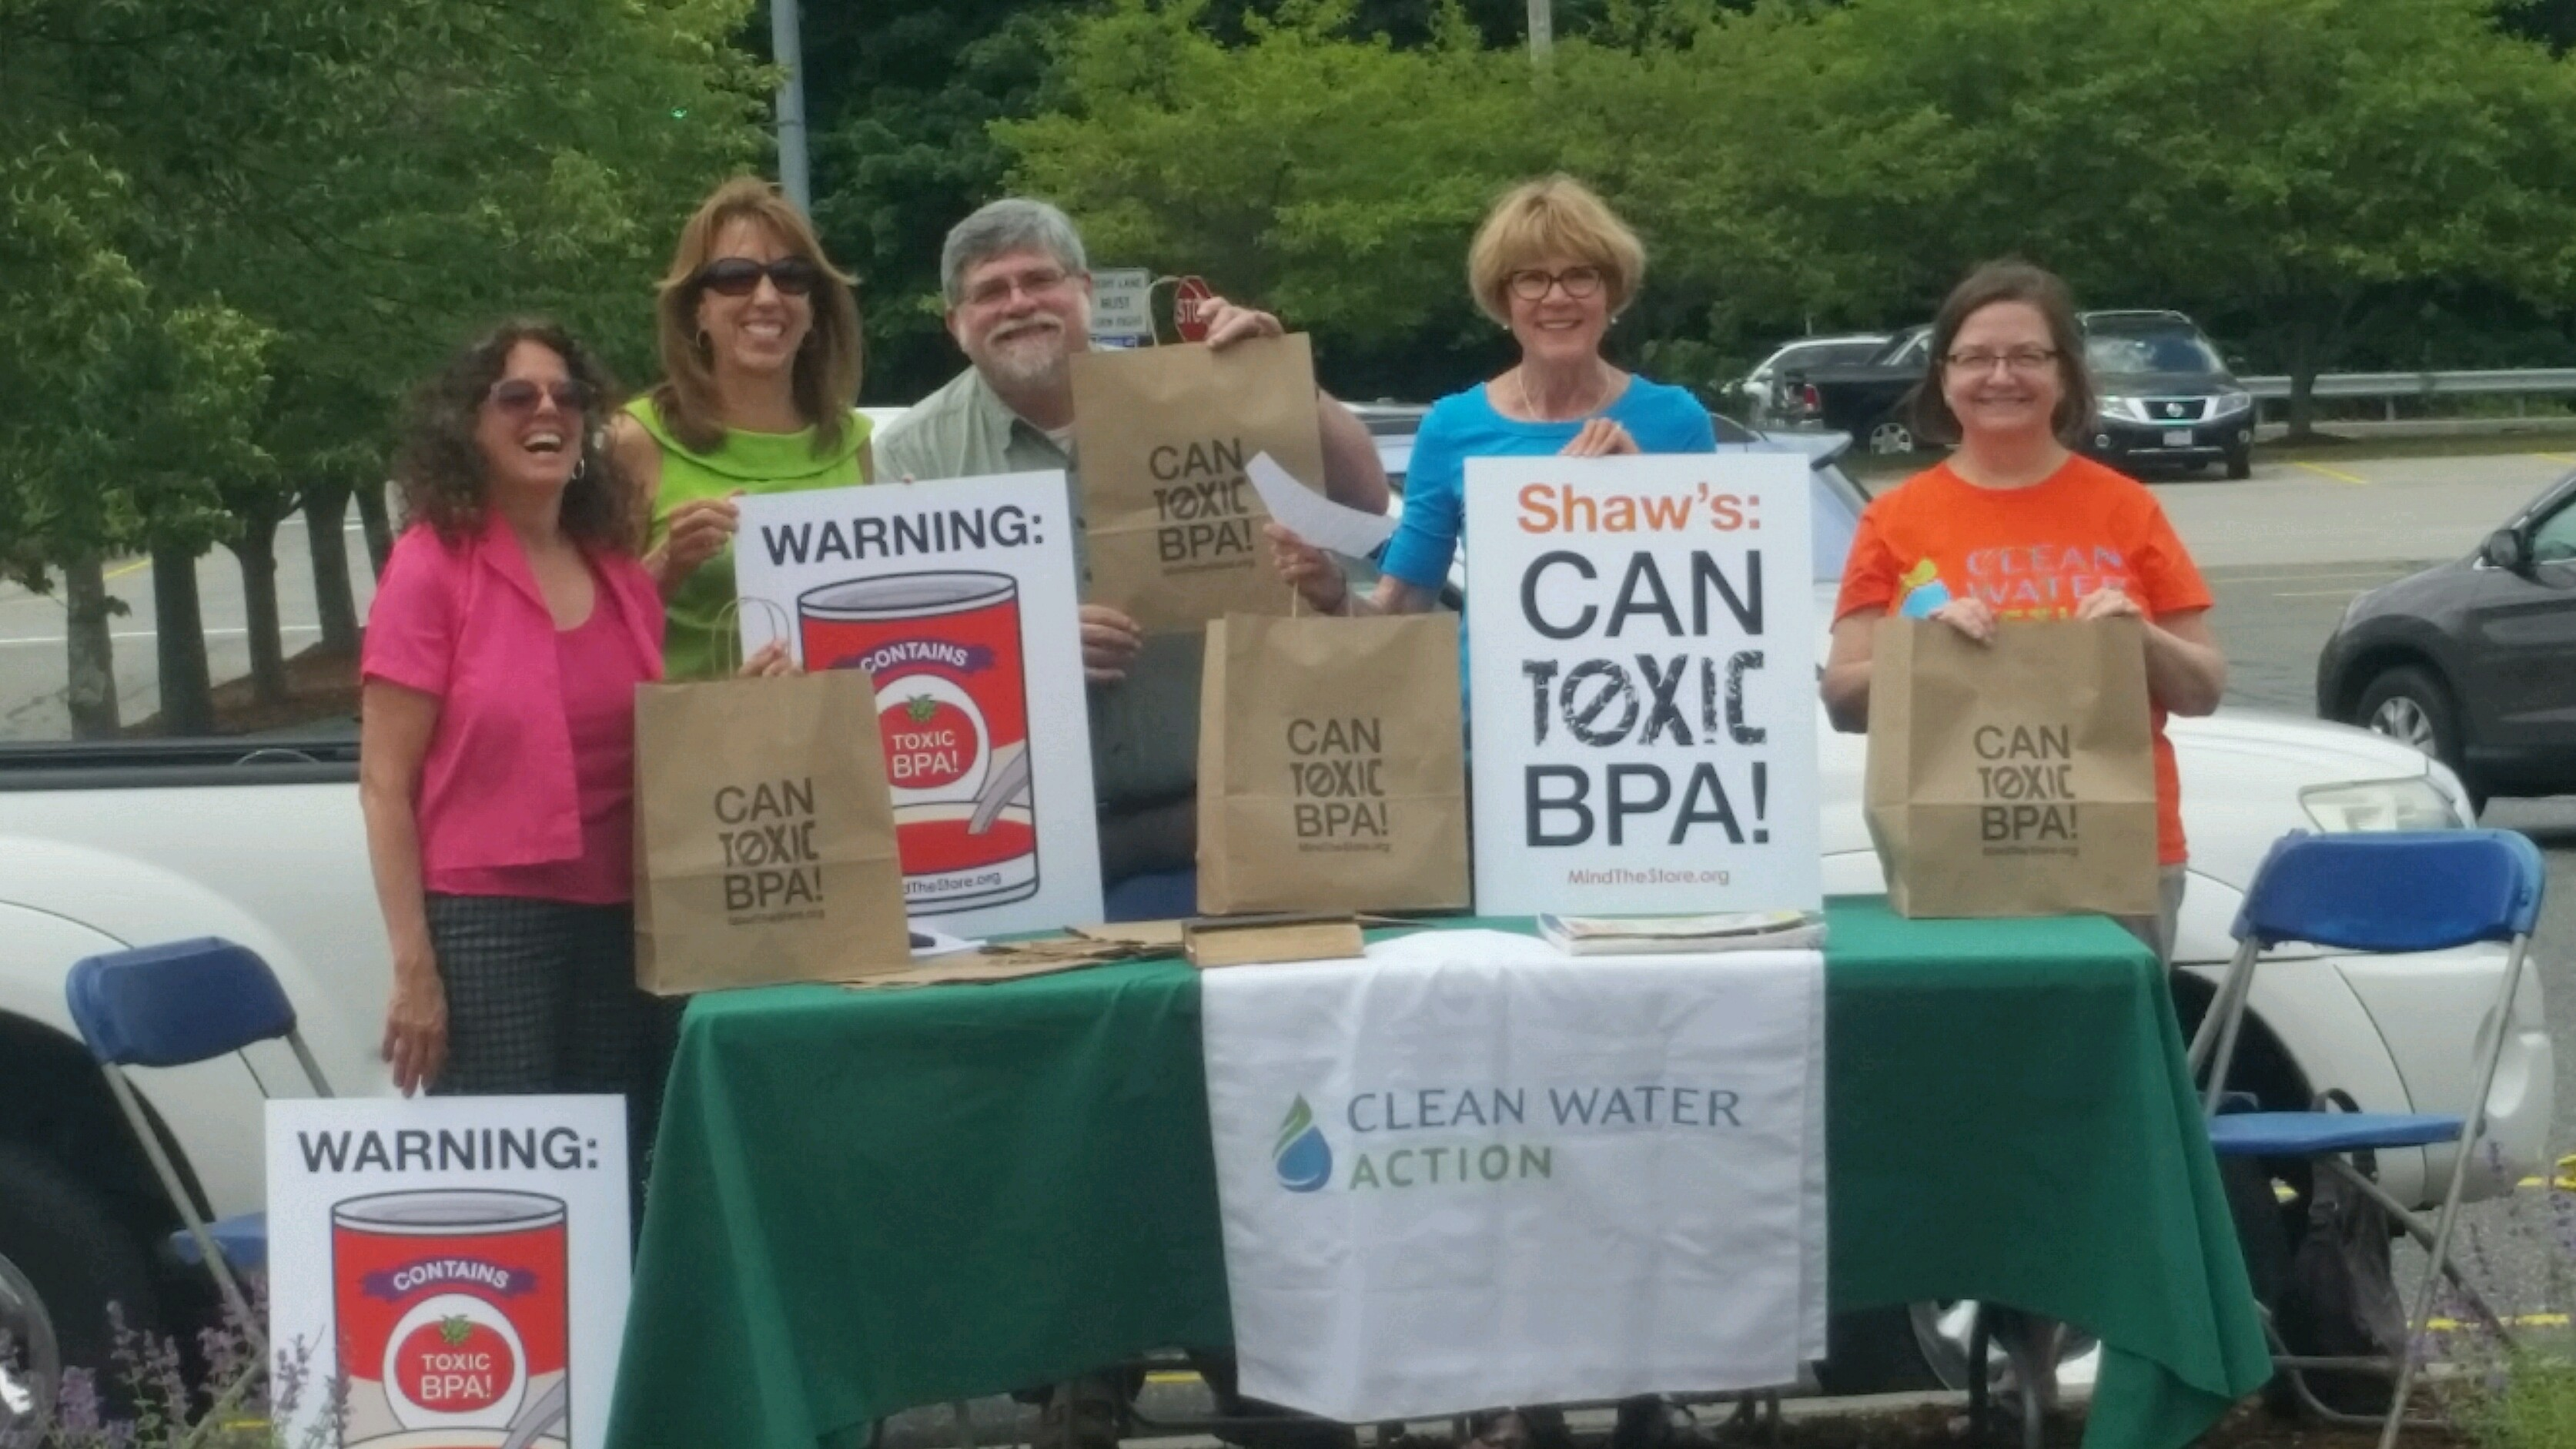 BPA_RhodeIsland_CleanWaterAction_Photo by Sara Moffett.jpg